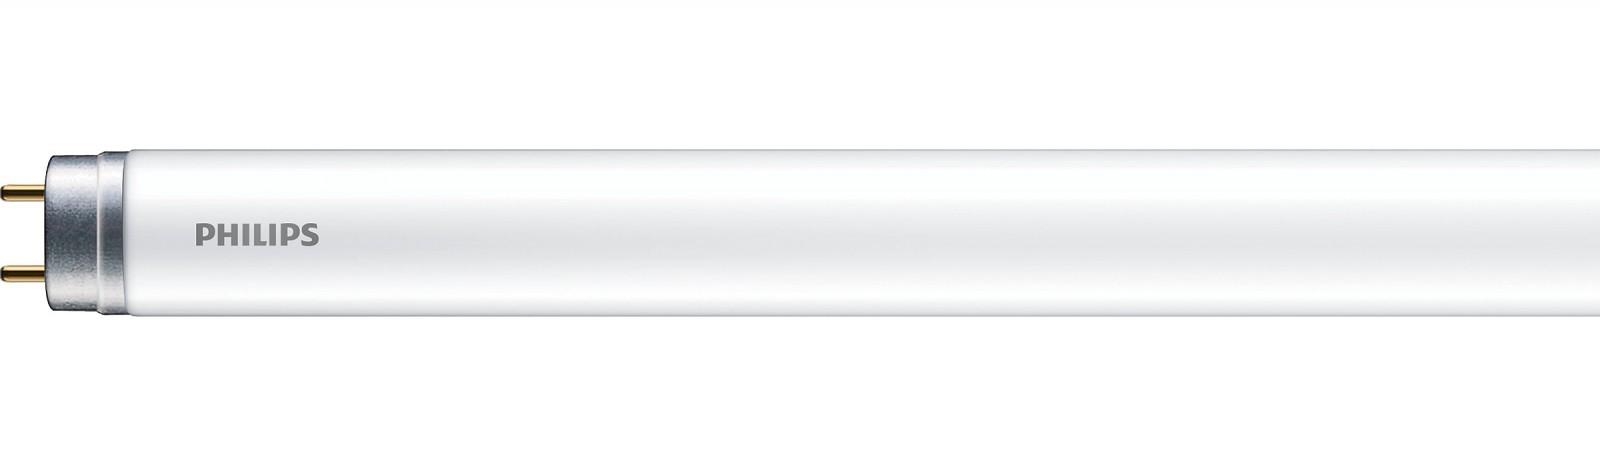 Tub LED Philips Ecofit T8, 20W, 2000 lm, 1500 mm, lumina naturala 4000K